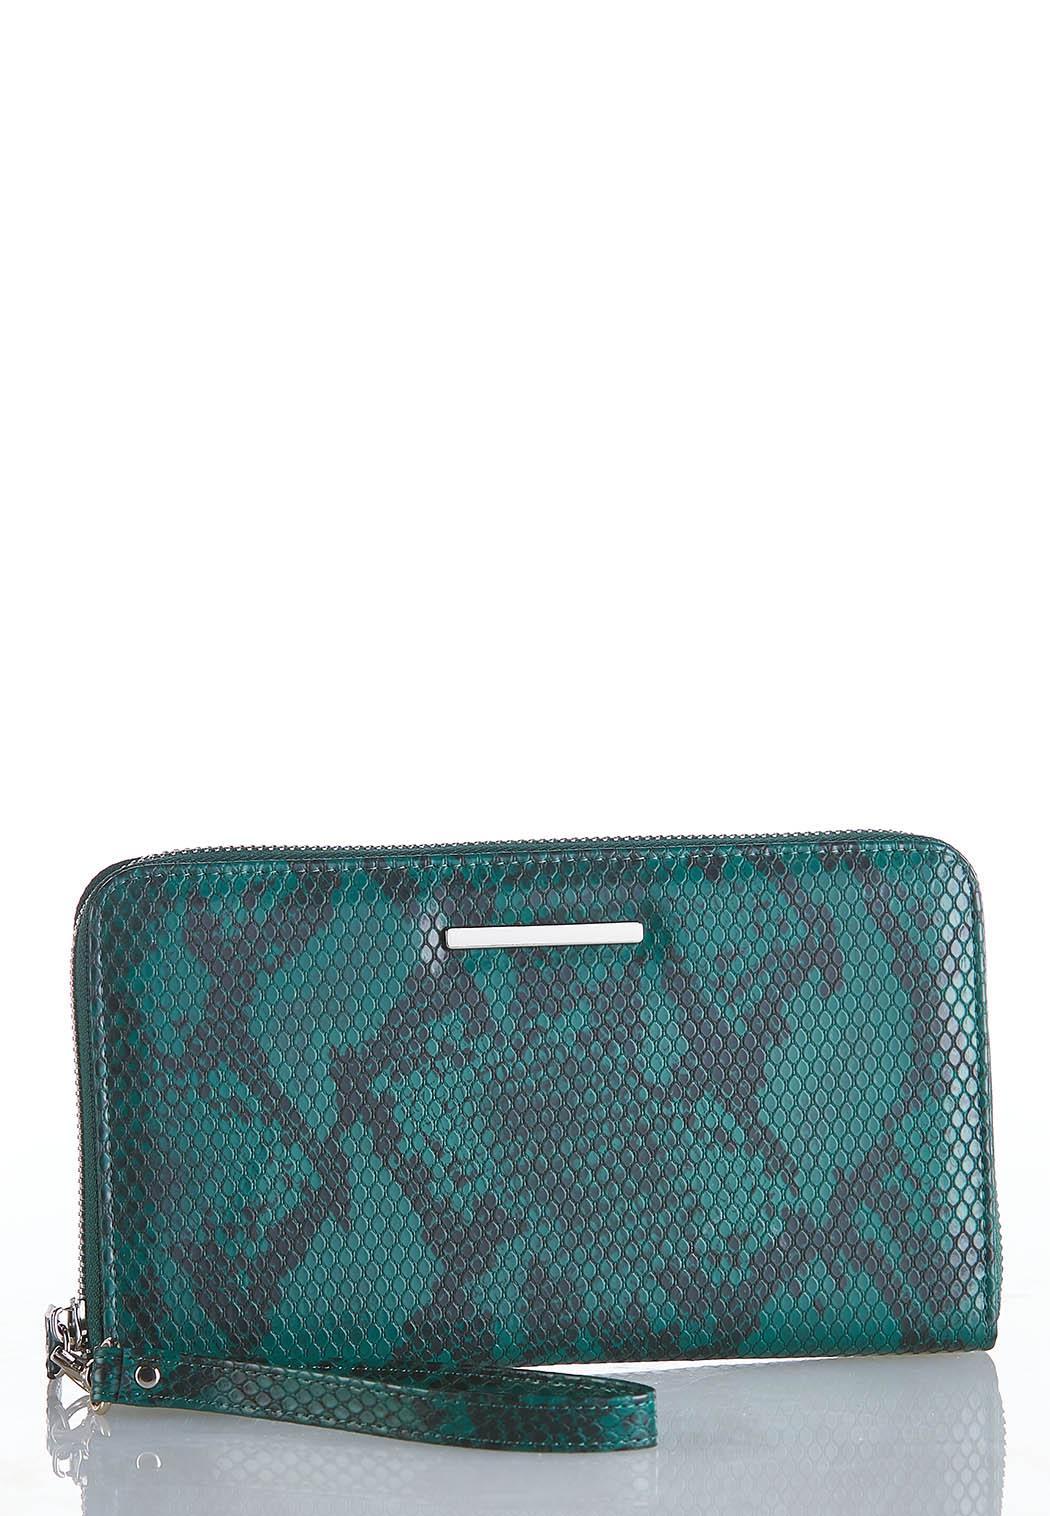 Snakeskin Zippered Wristlet Wallet